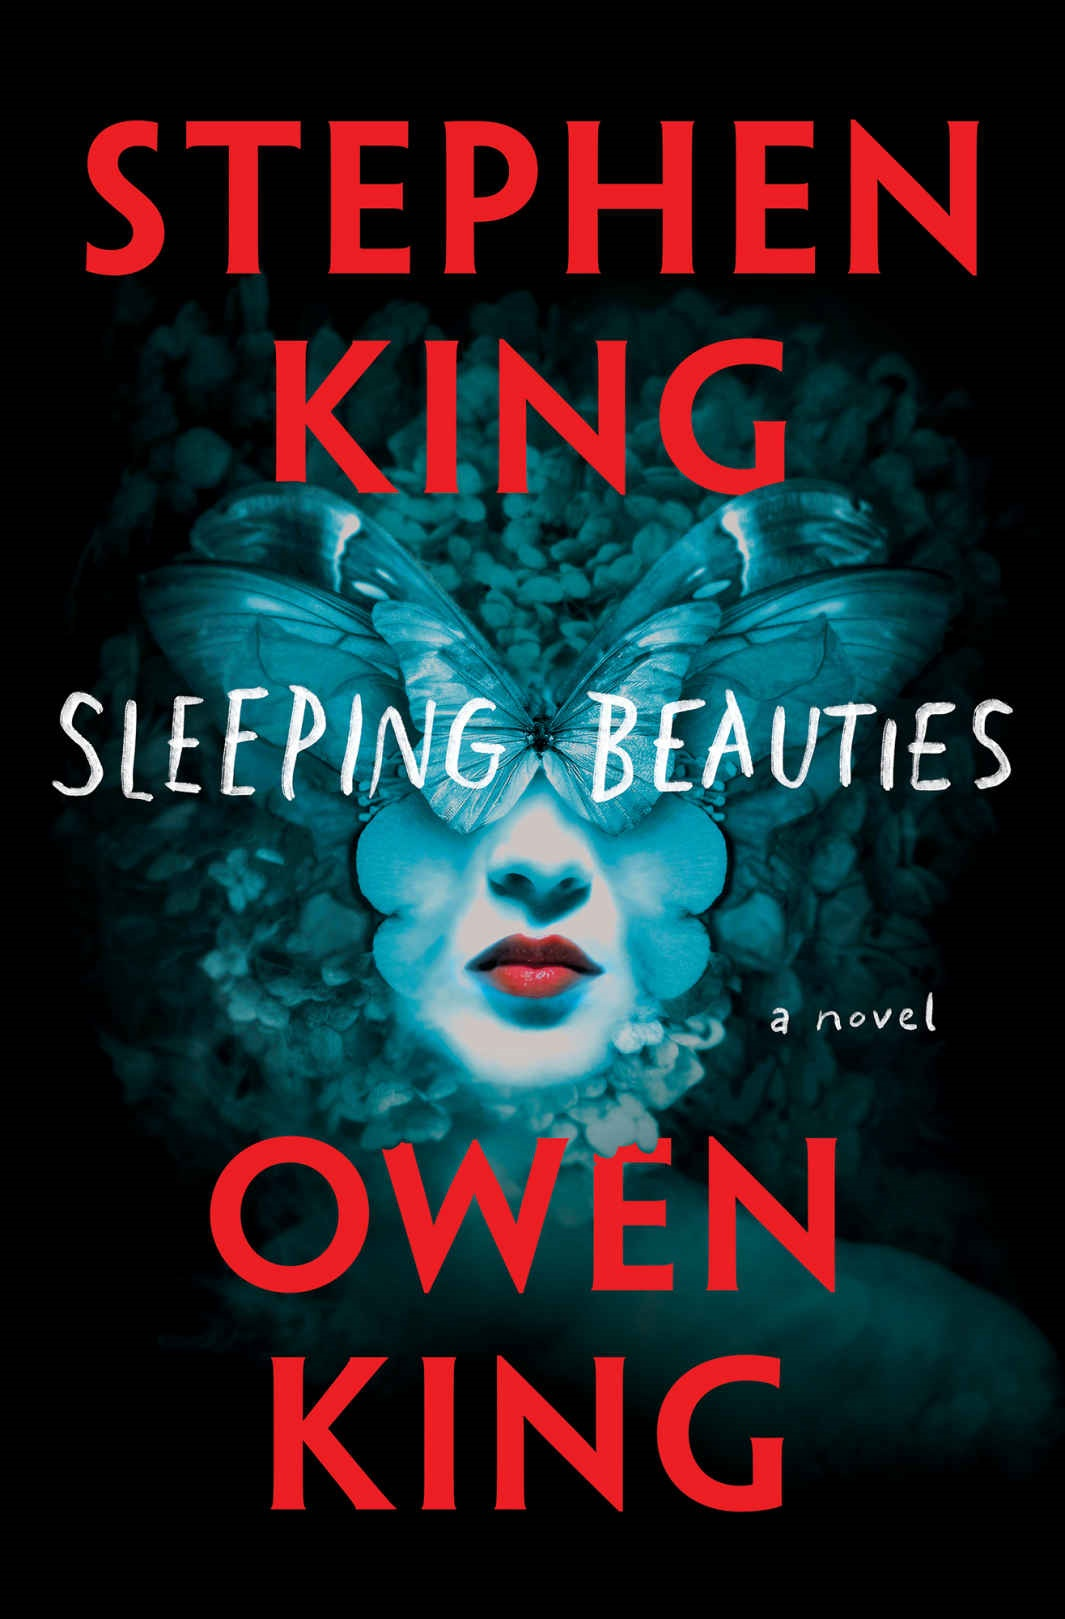 Sleeping Beauties: A Novel - Stephen King & Owen King [kindle] [mobi]